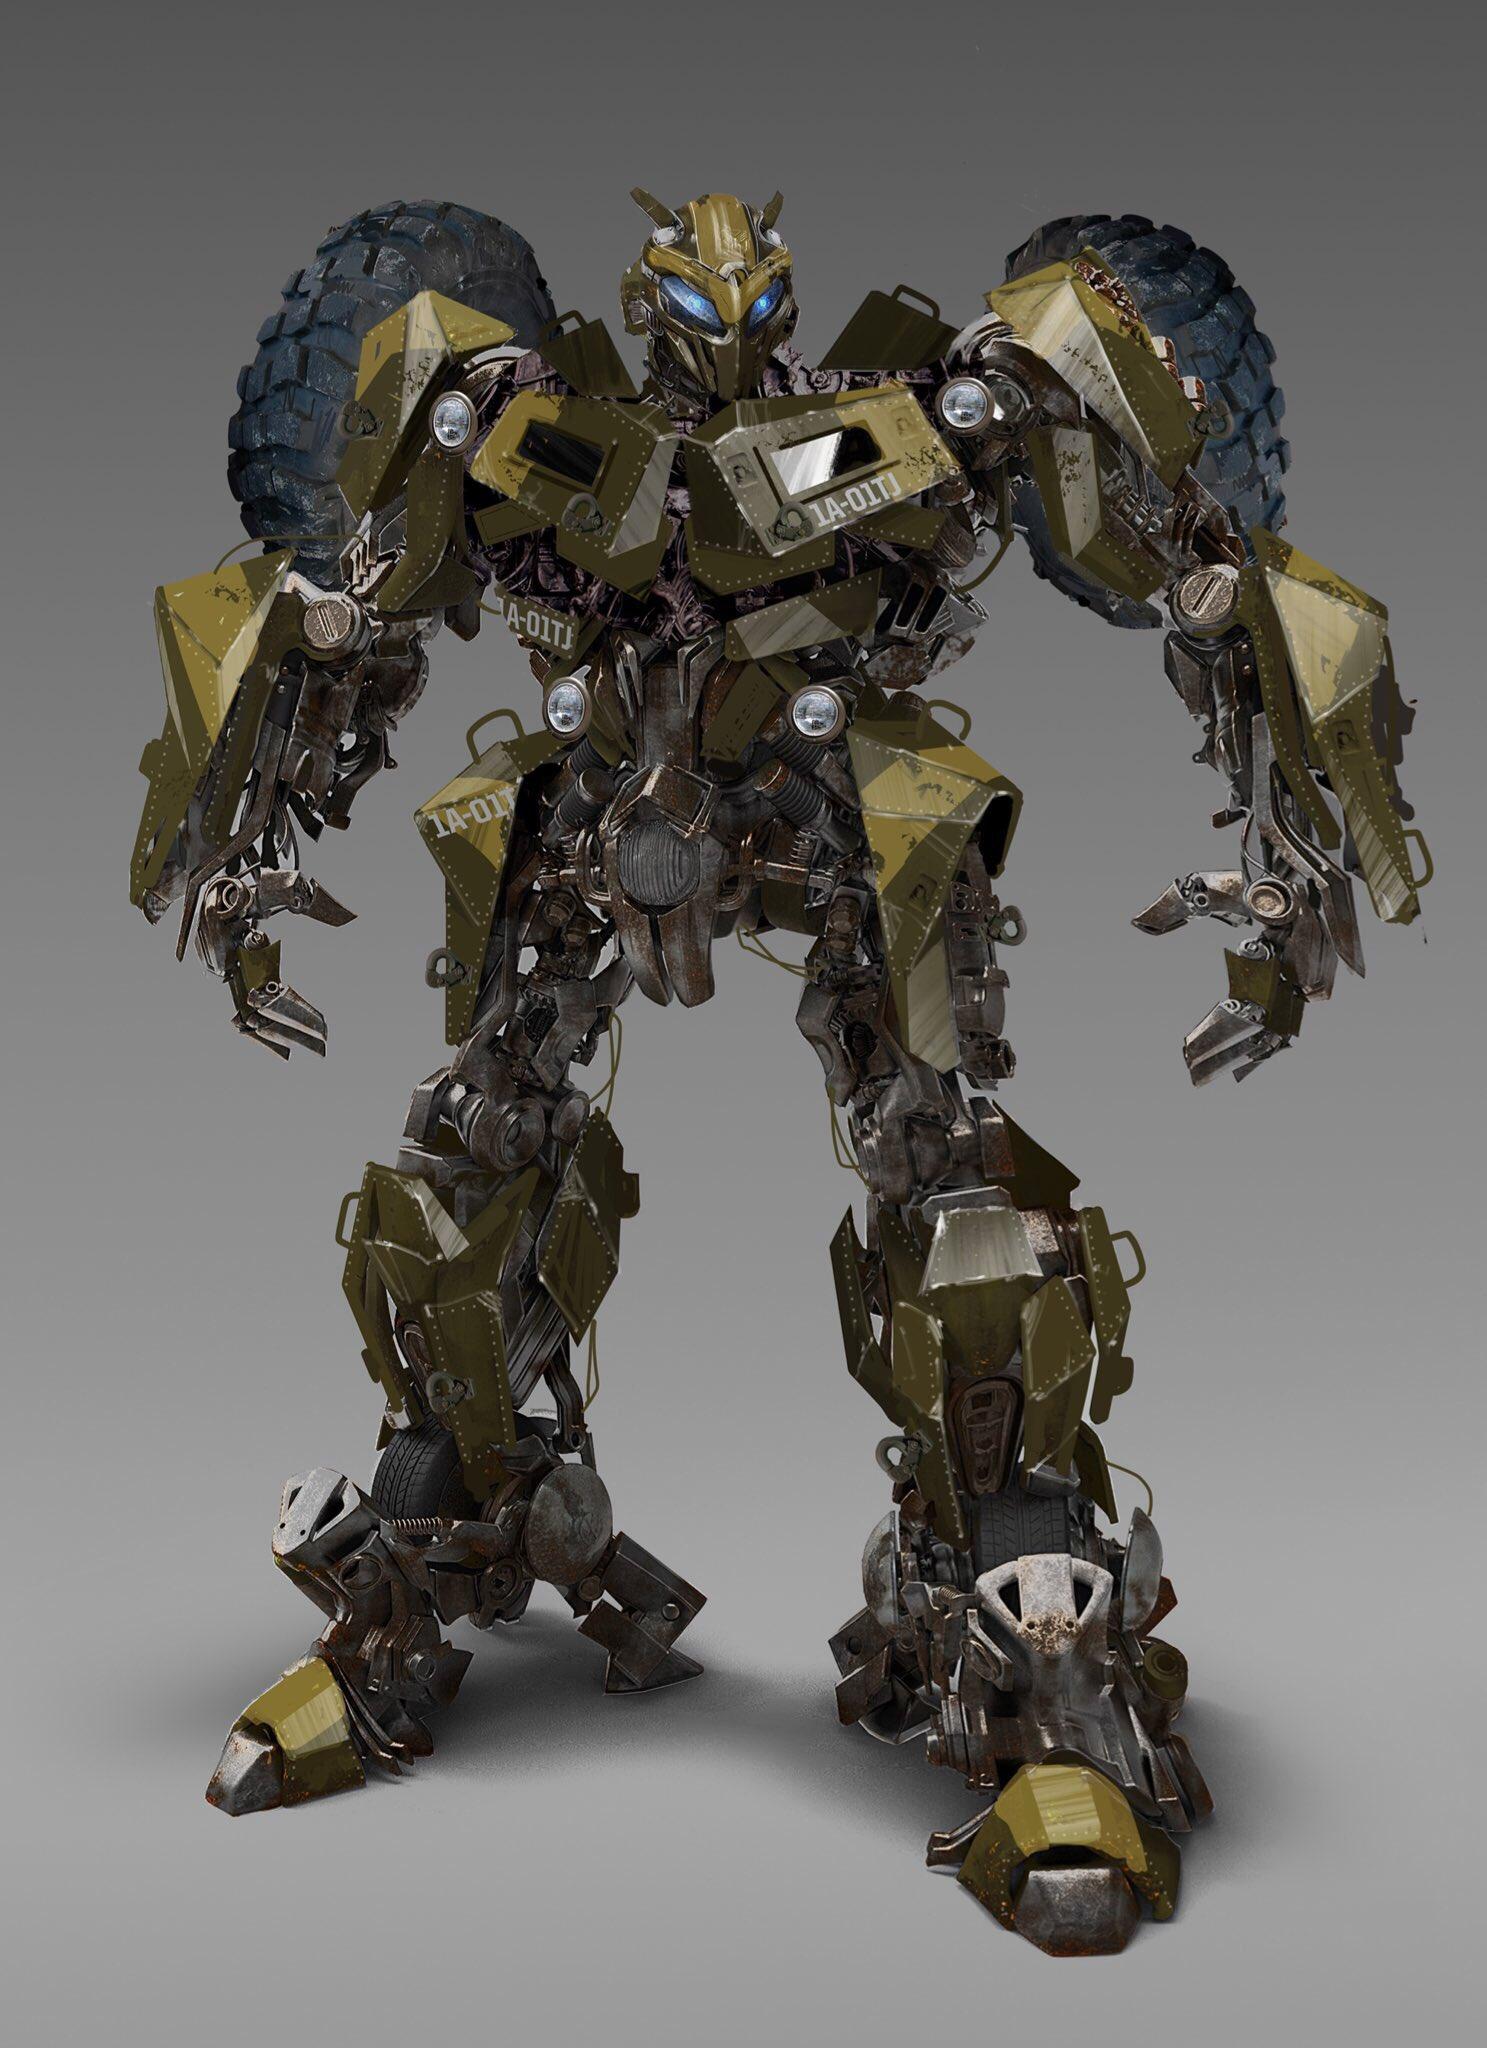 Bumblebee Movie Concept Art Round Up 5 Transformers News